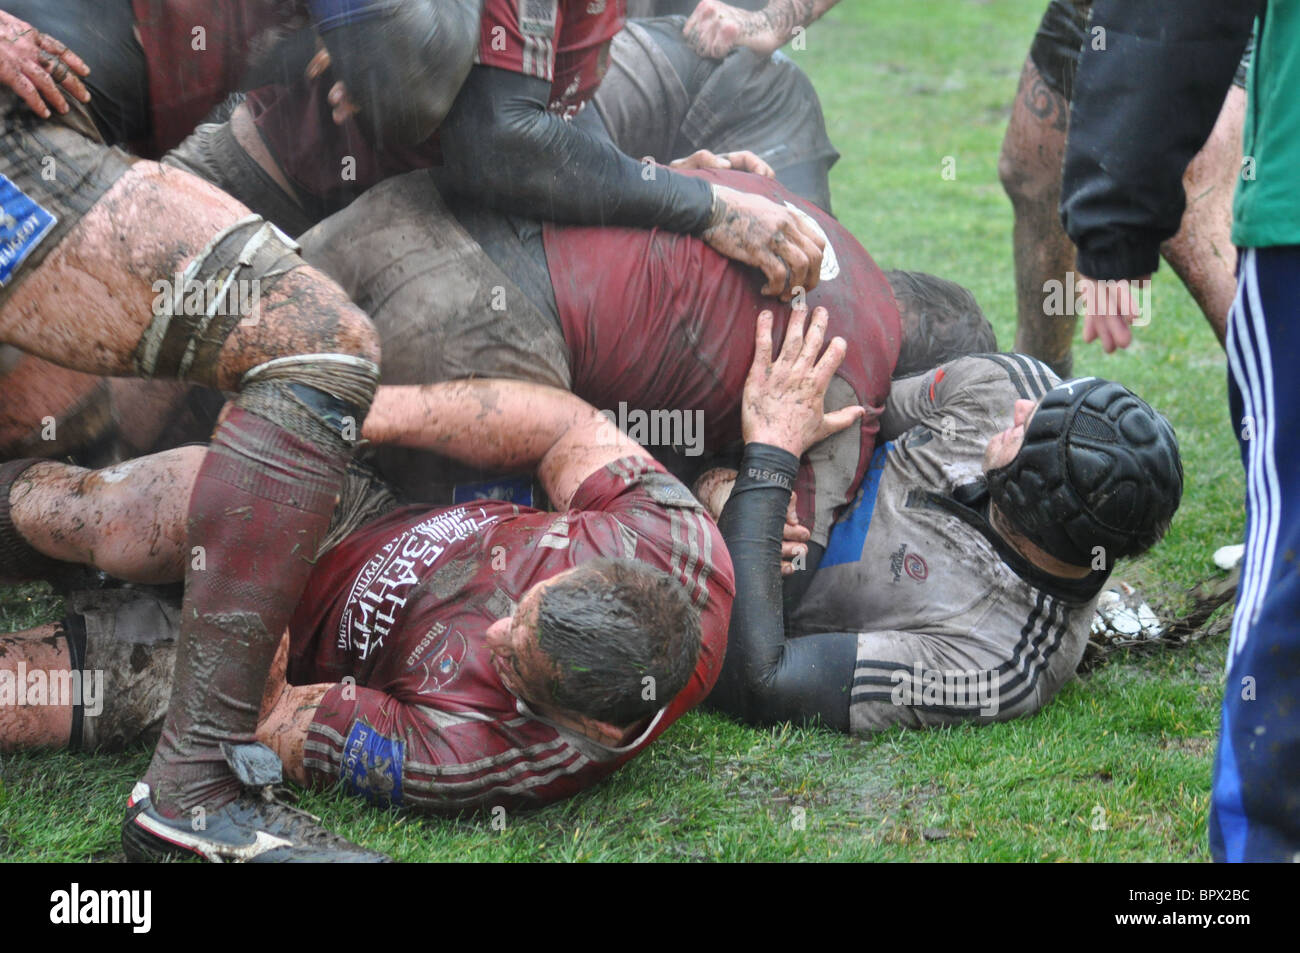 Match de rugby coupe d'Europe des nations: la Russie 14 - 10 Portugal Photo Stock